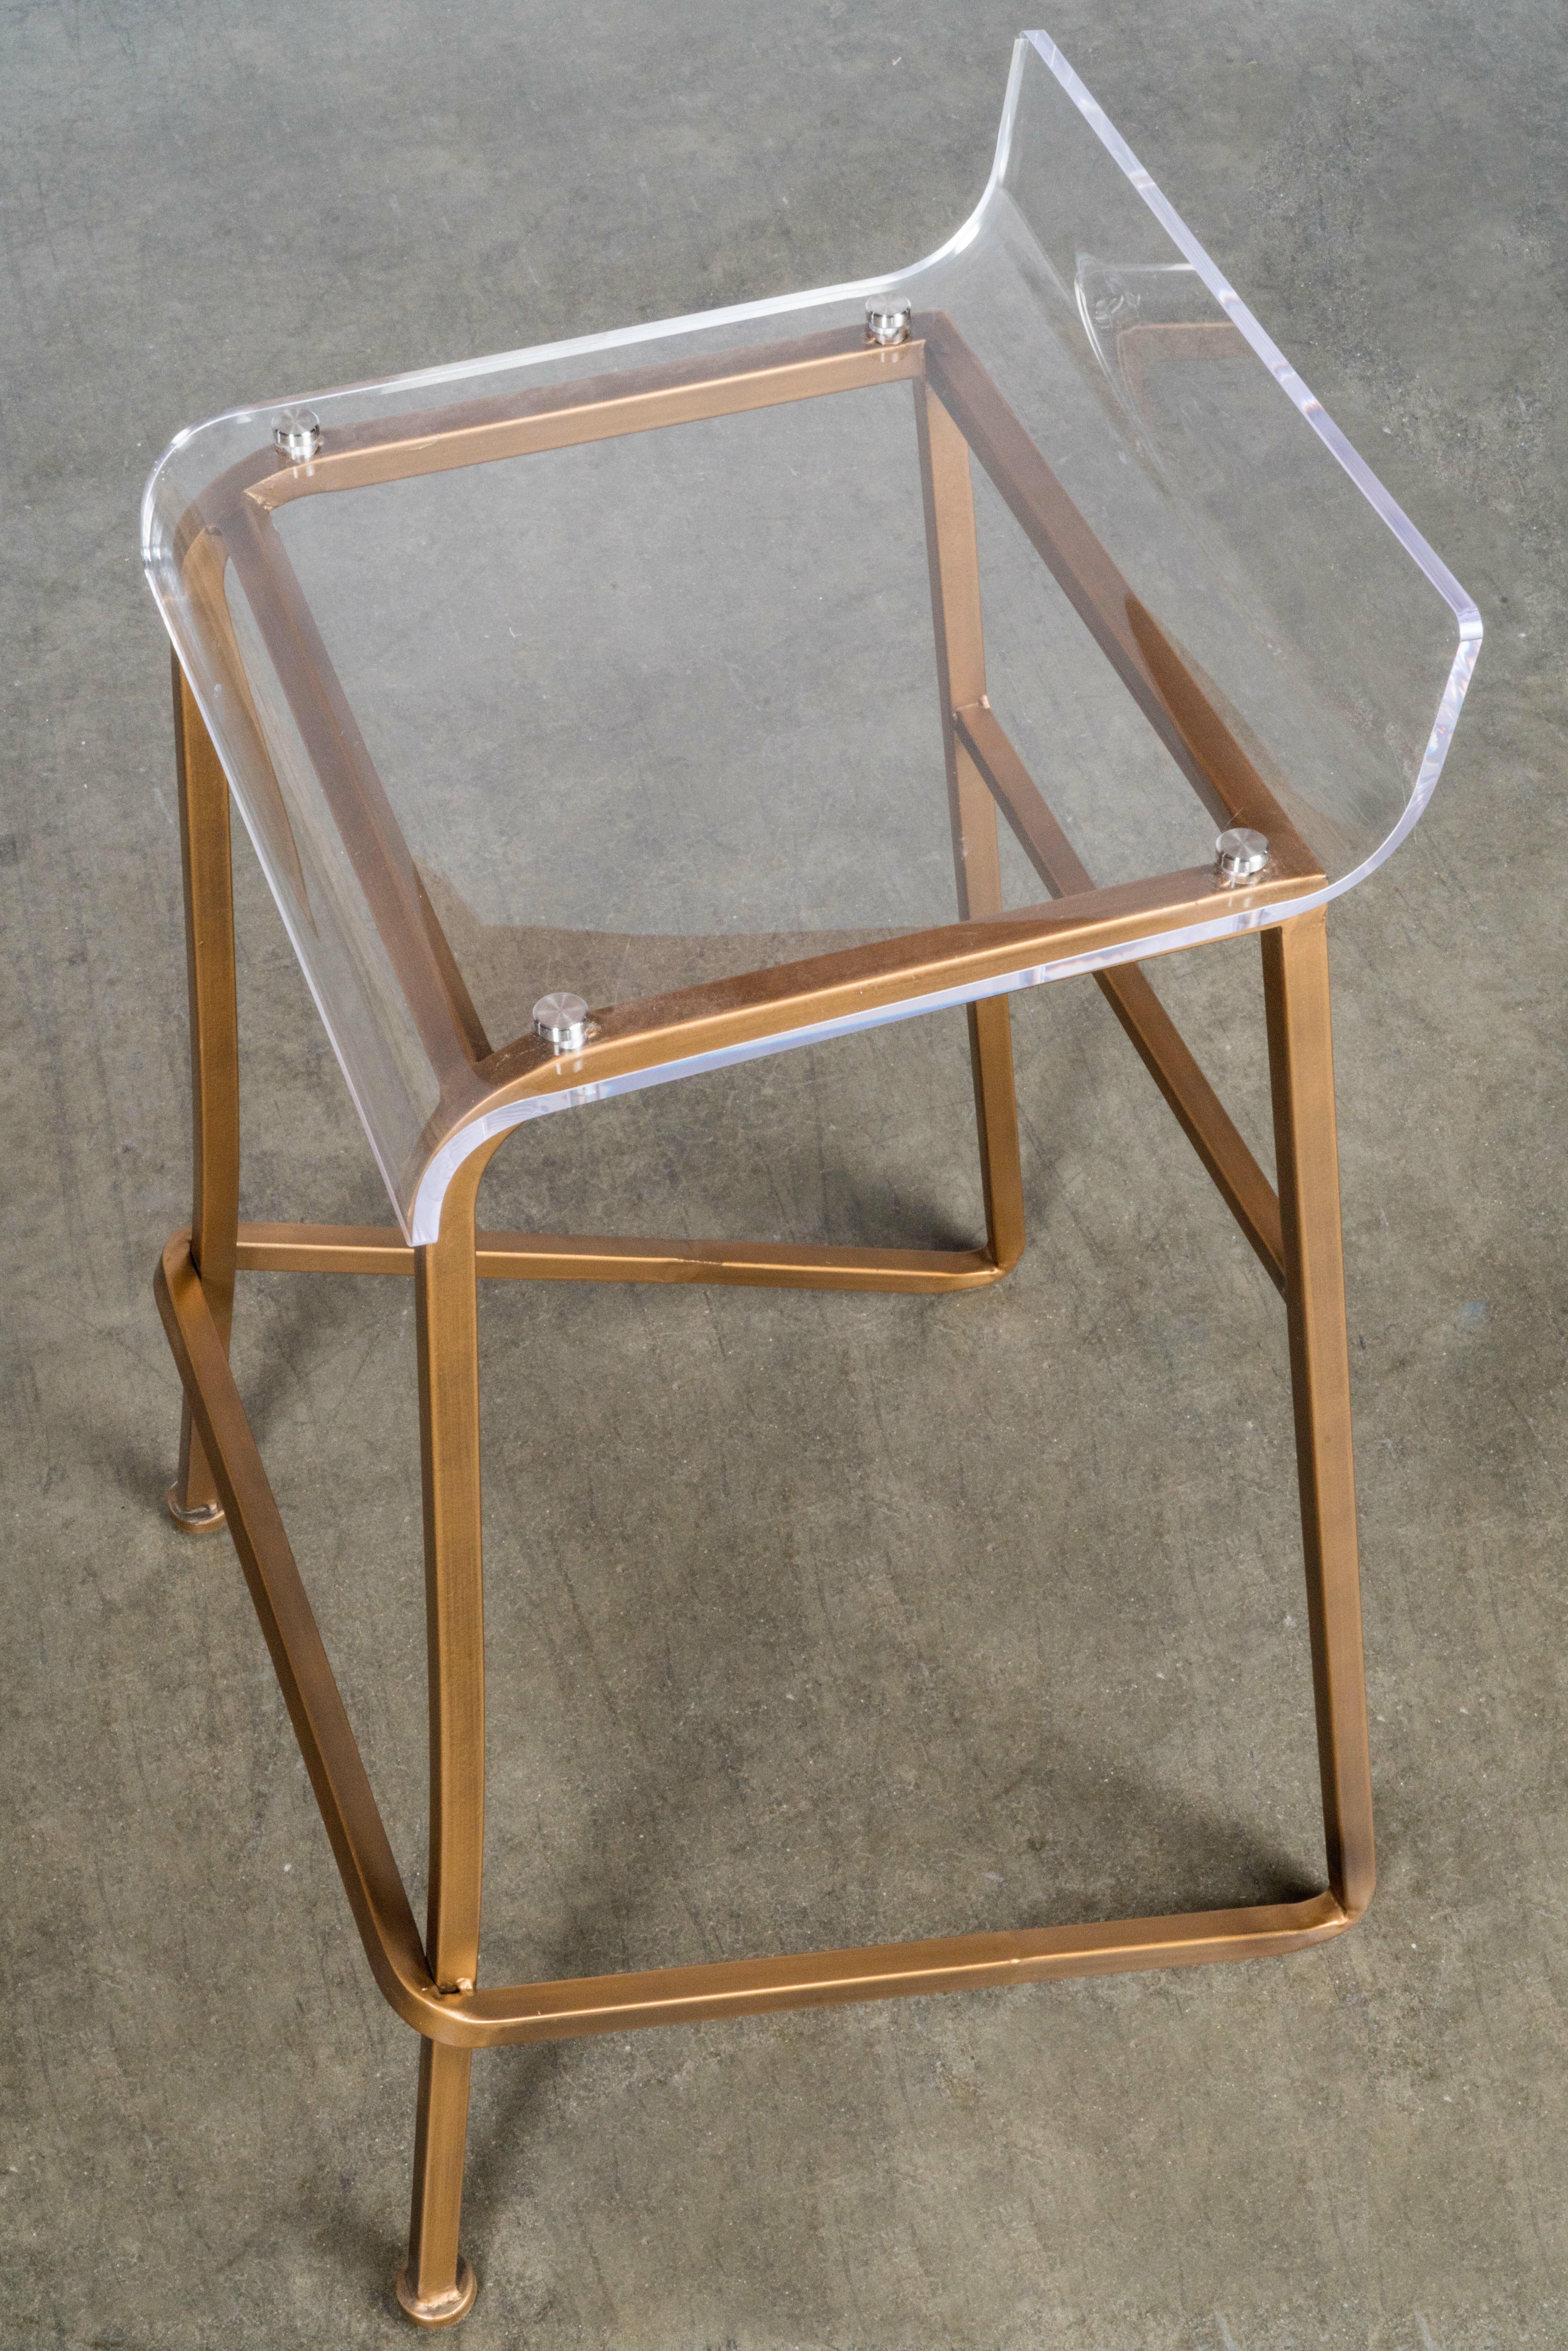 Magnificent Statements By J Acrylic Counter Stool Reviews Wayfair Inzonedesignstudio Interior Chair Design Inzonedesignstudiocom